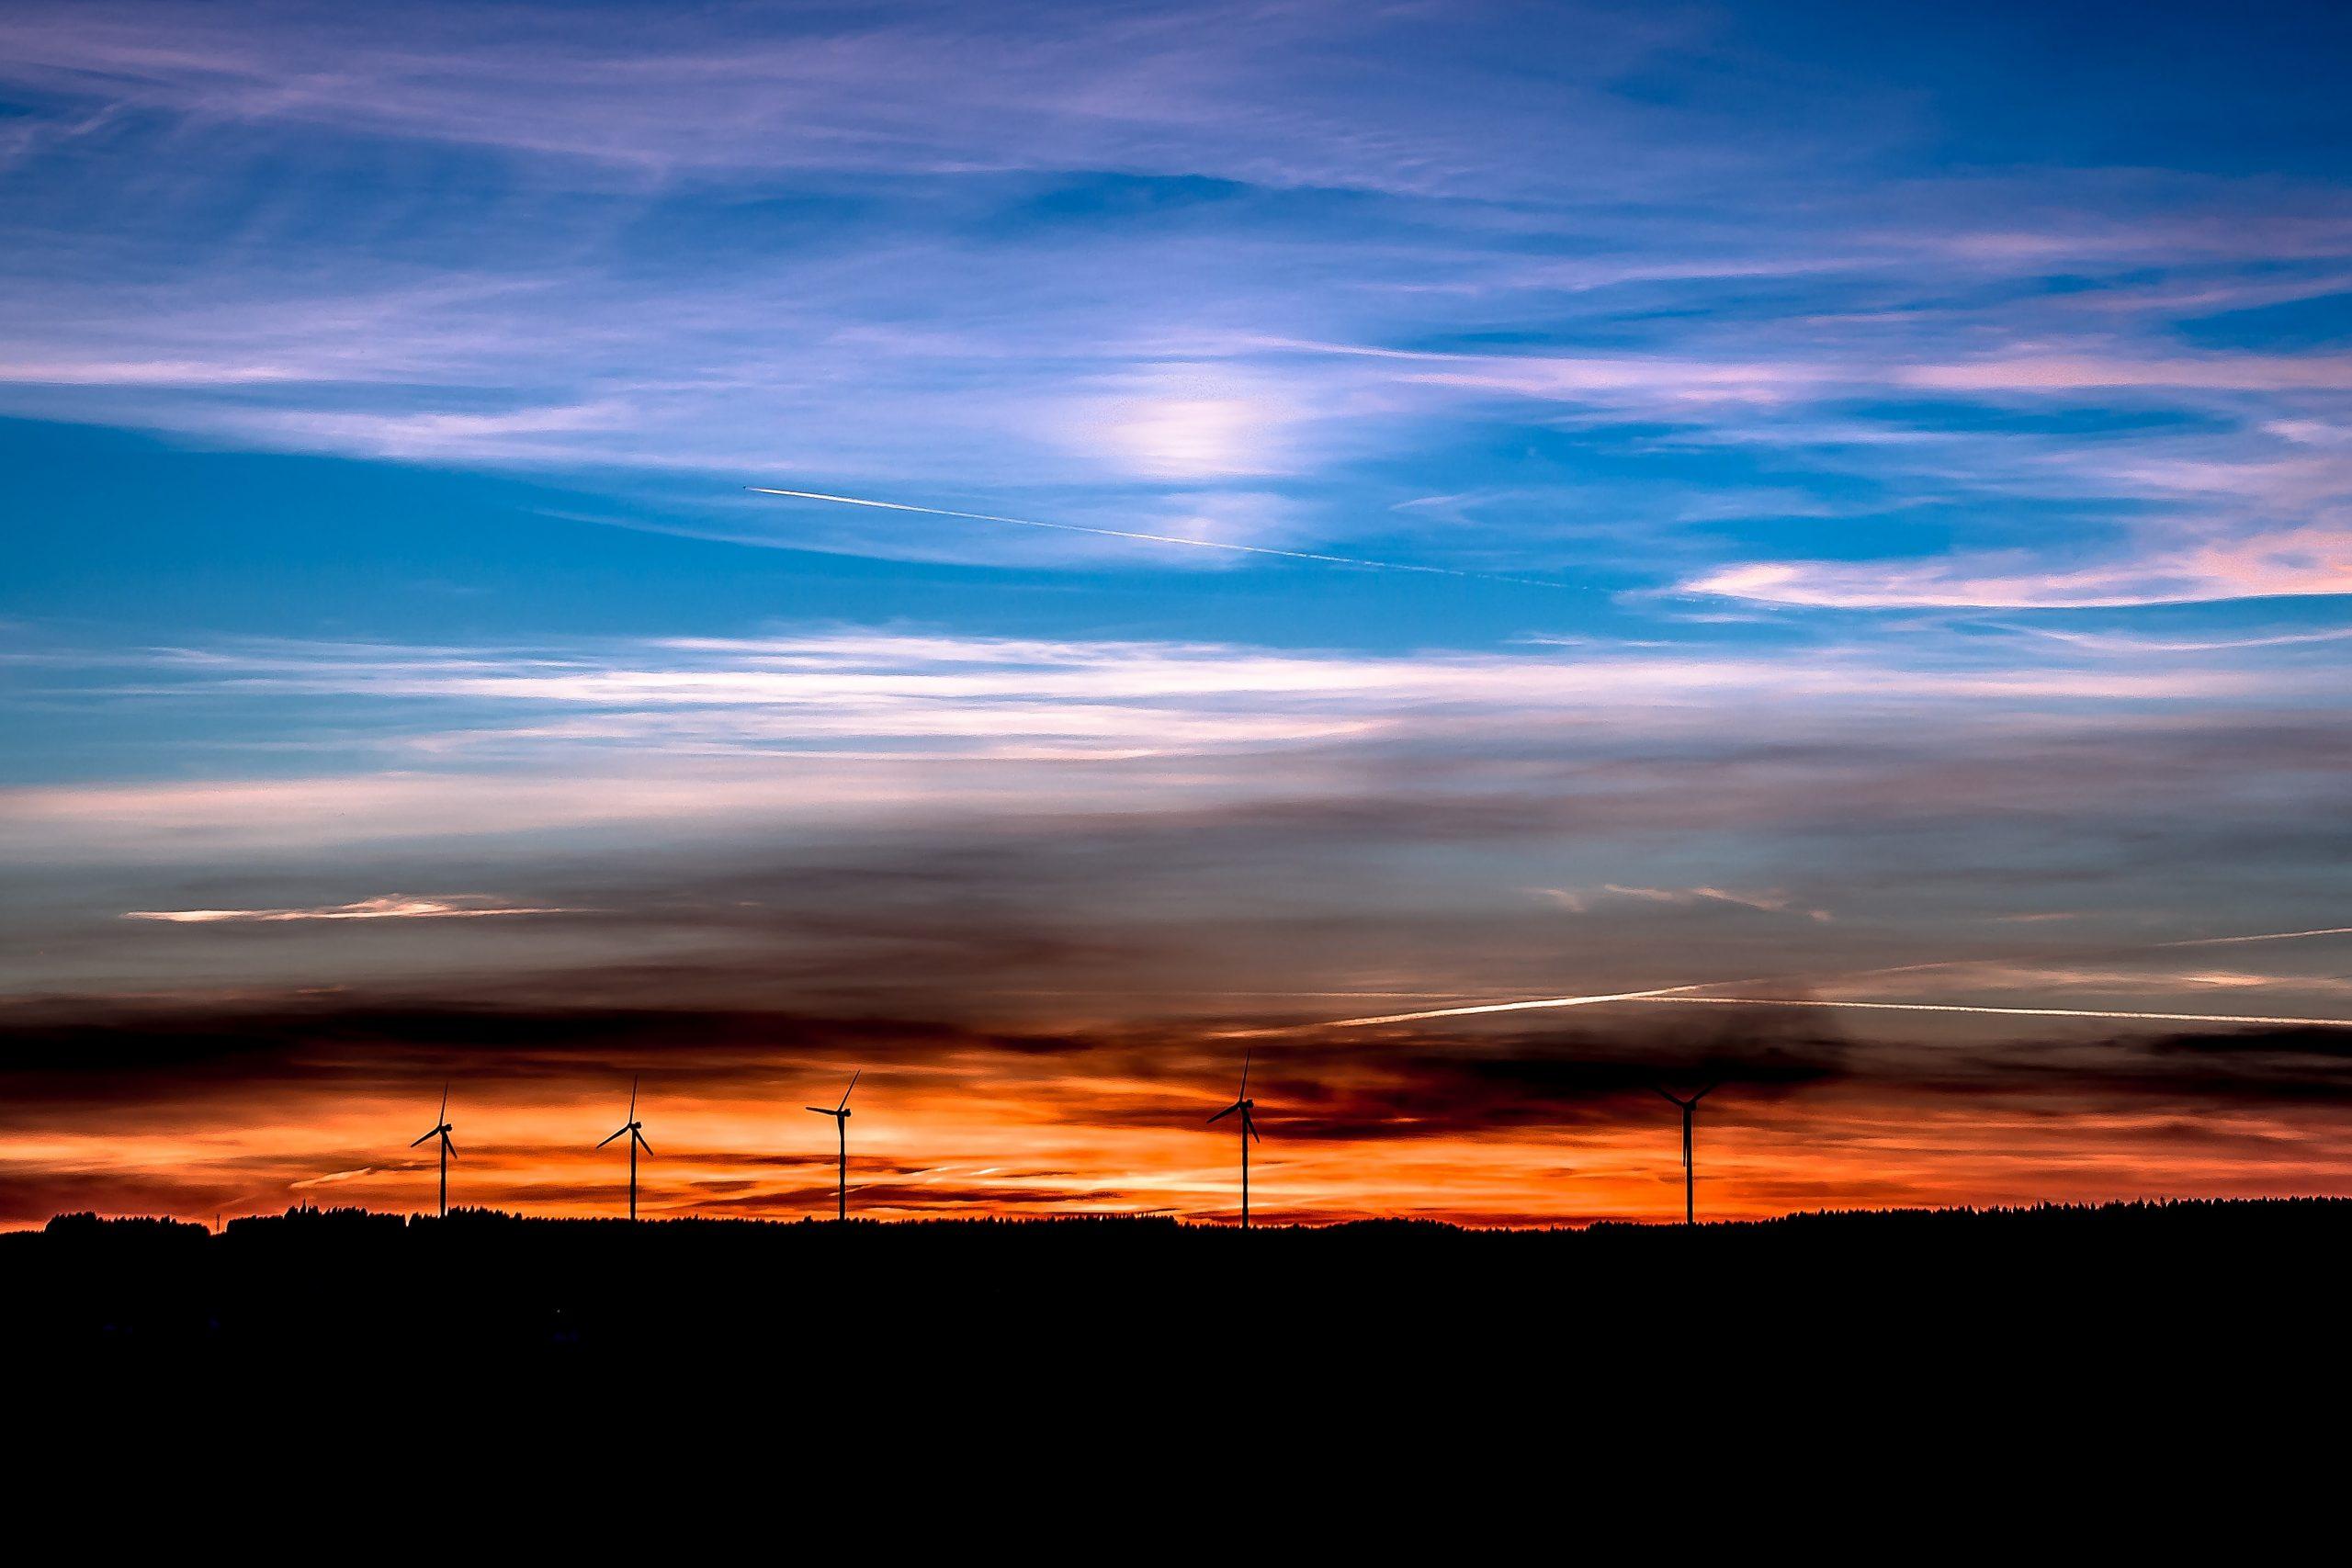 AleaSoft - Wind farm